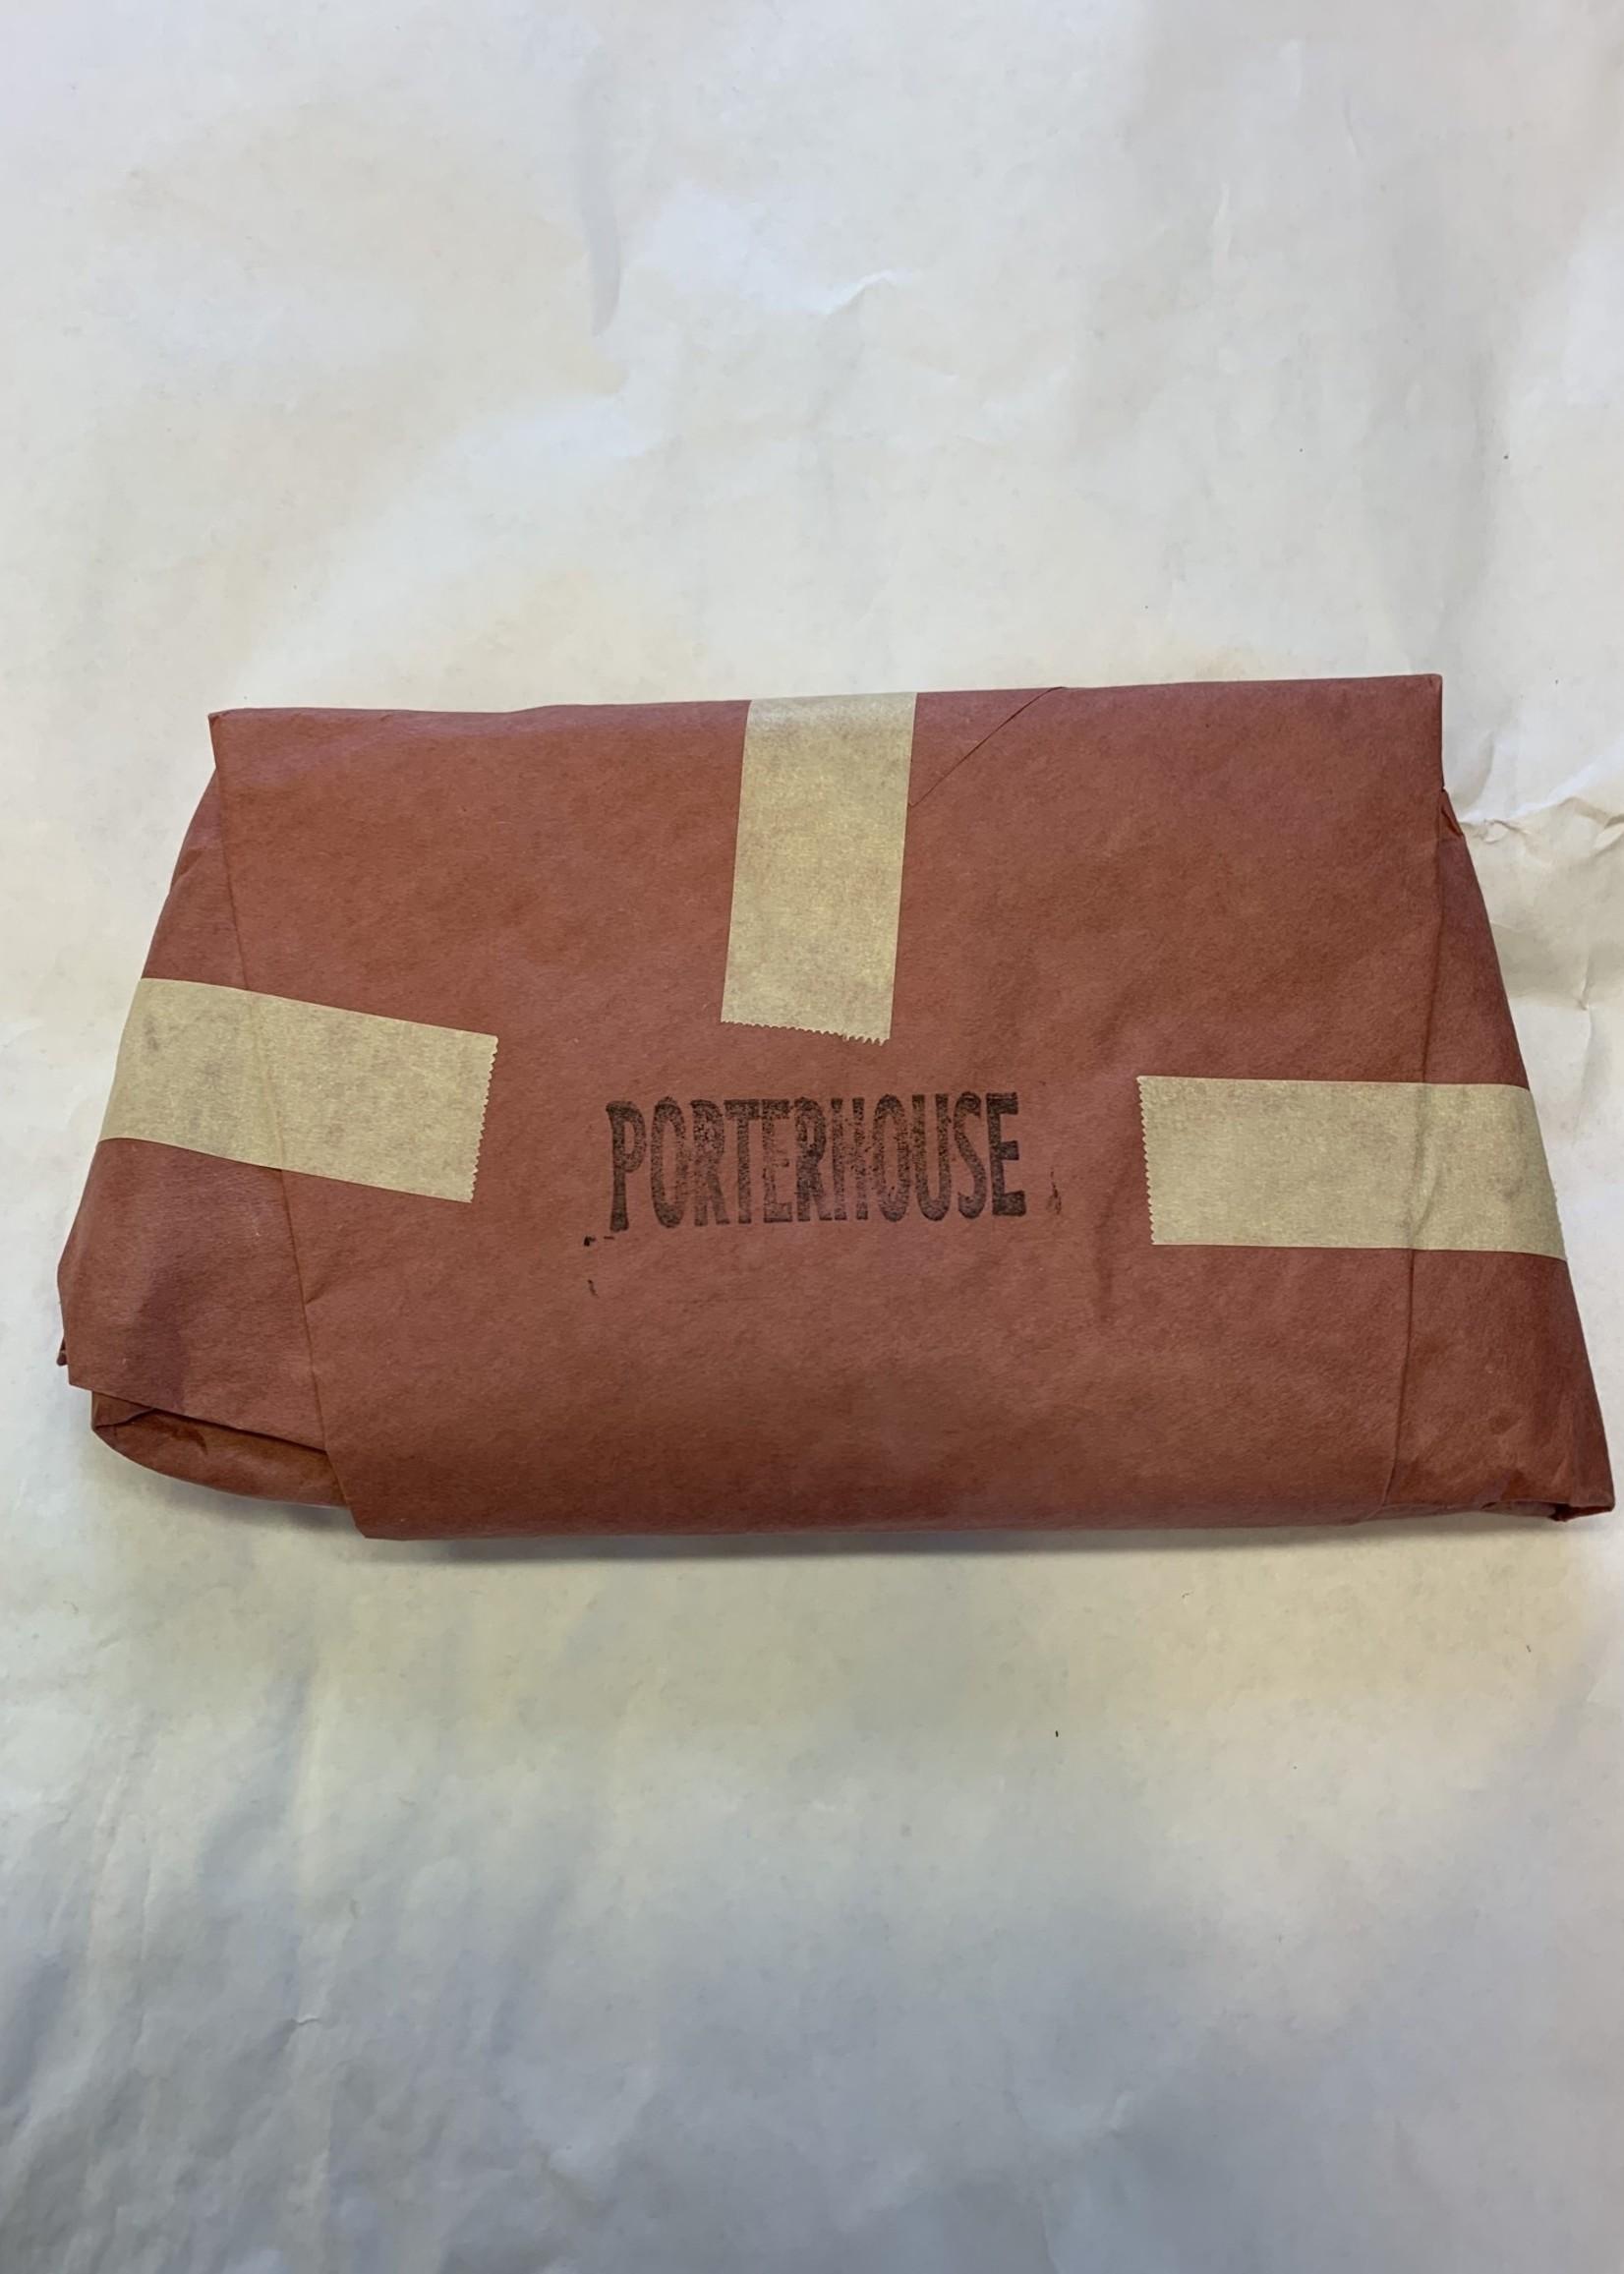 Heritage Heritage Porterhouse Steak  1+lb